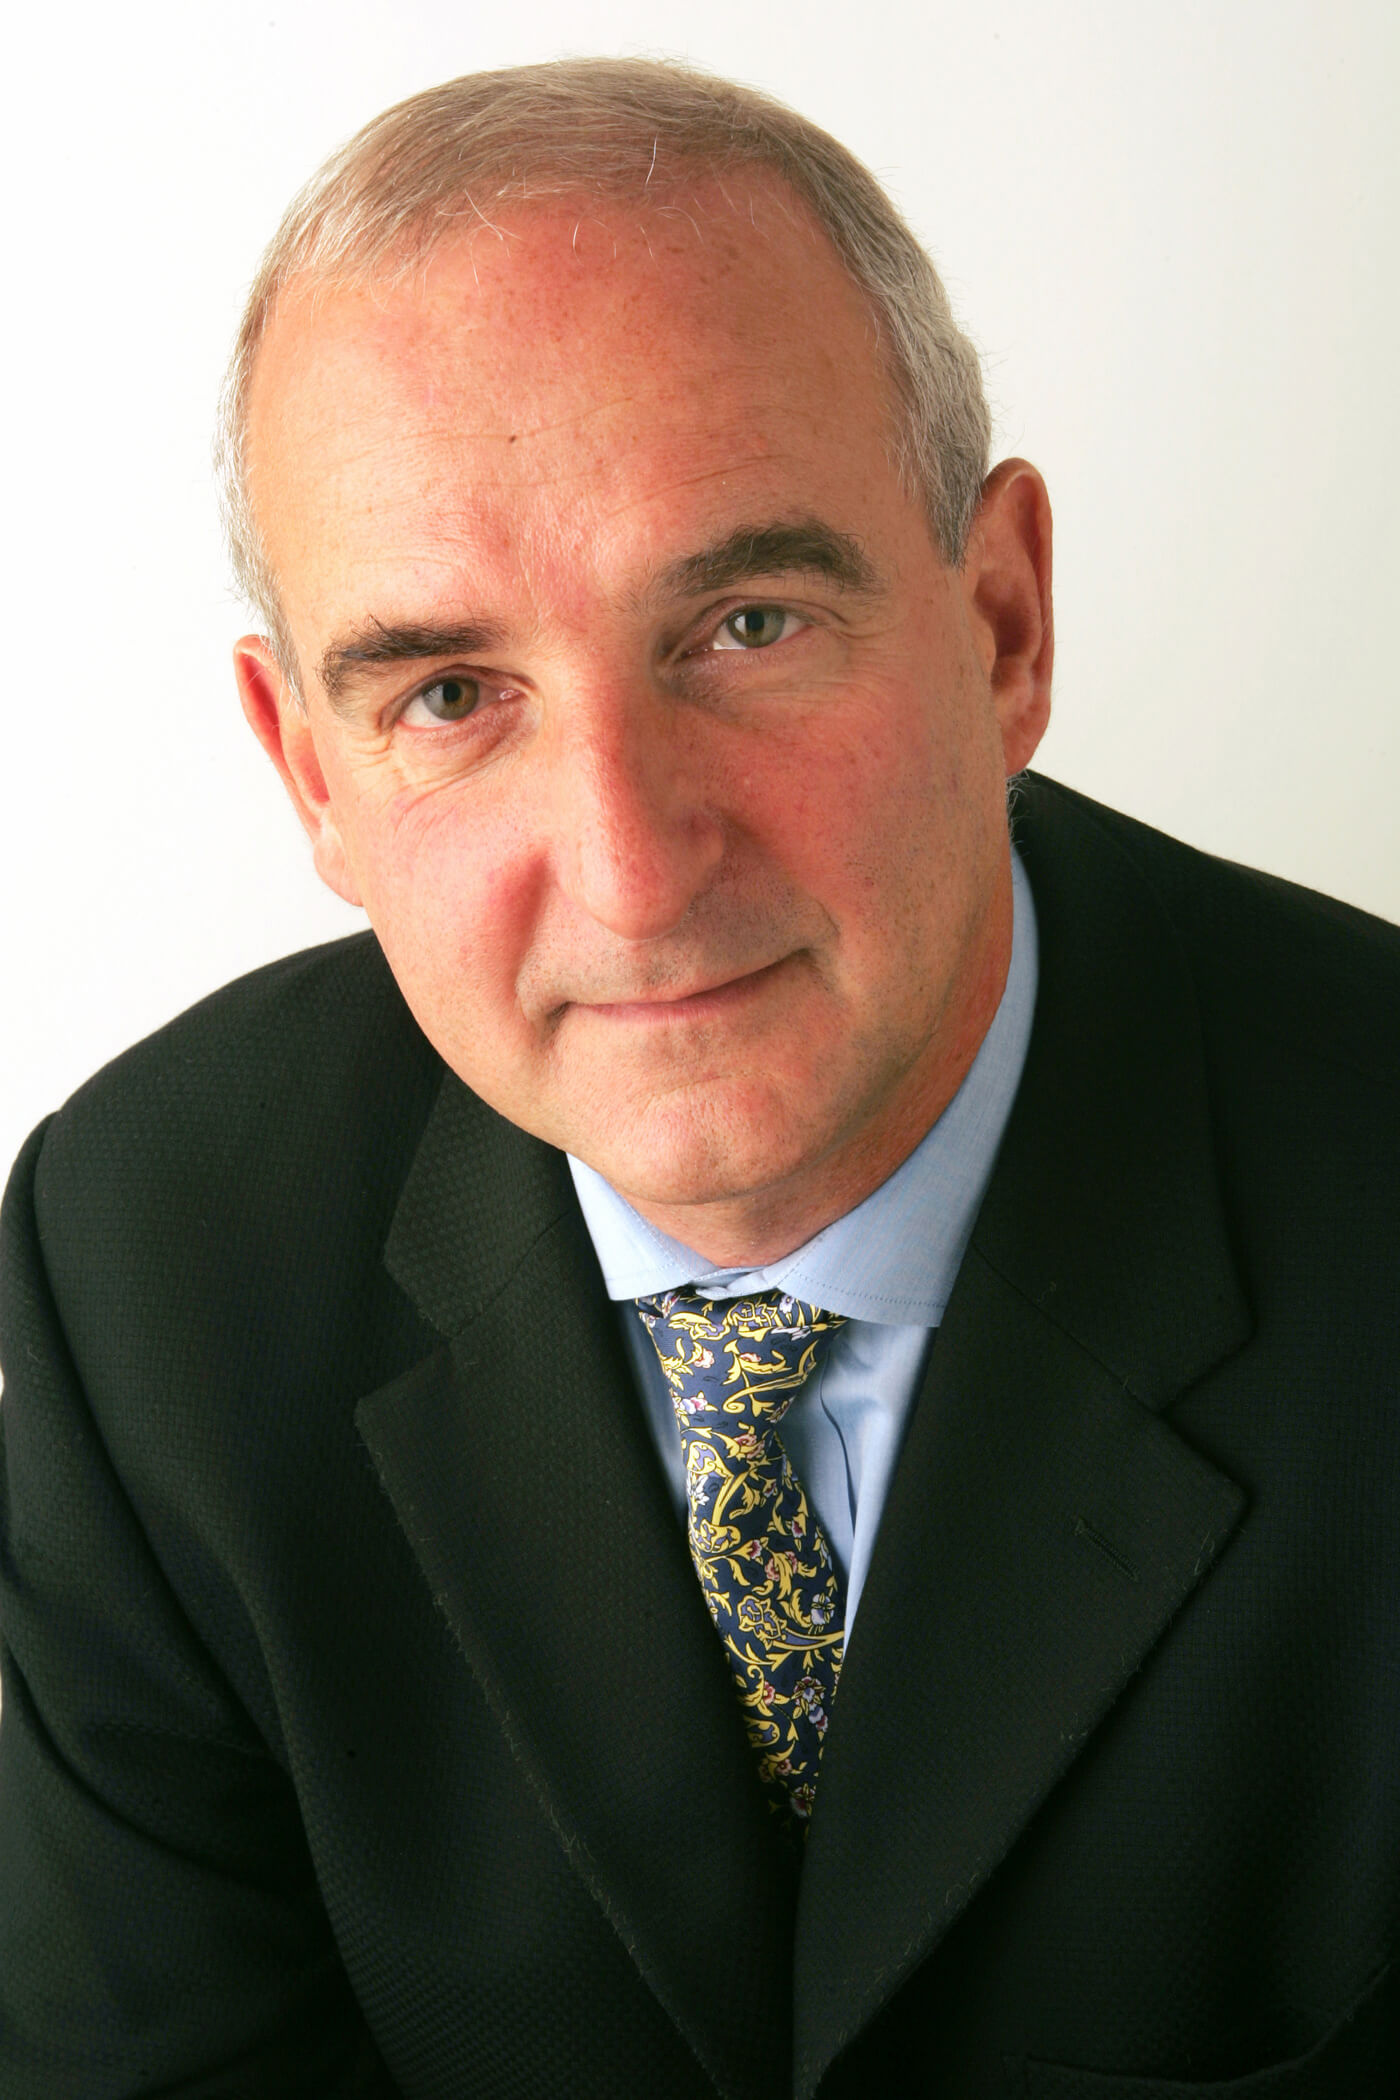 Roger E. Cohen